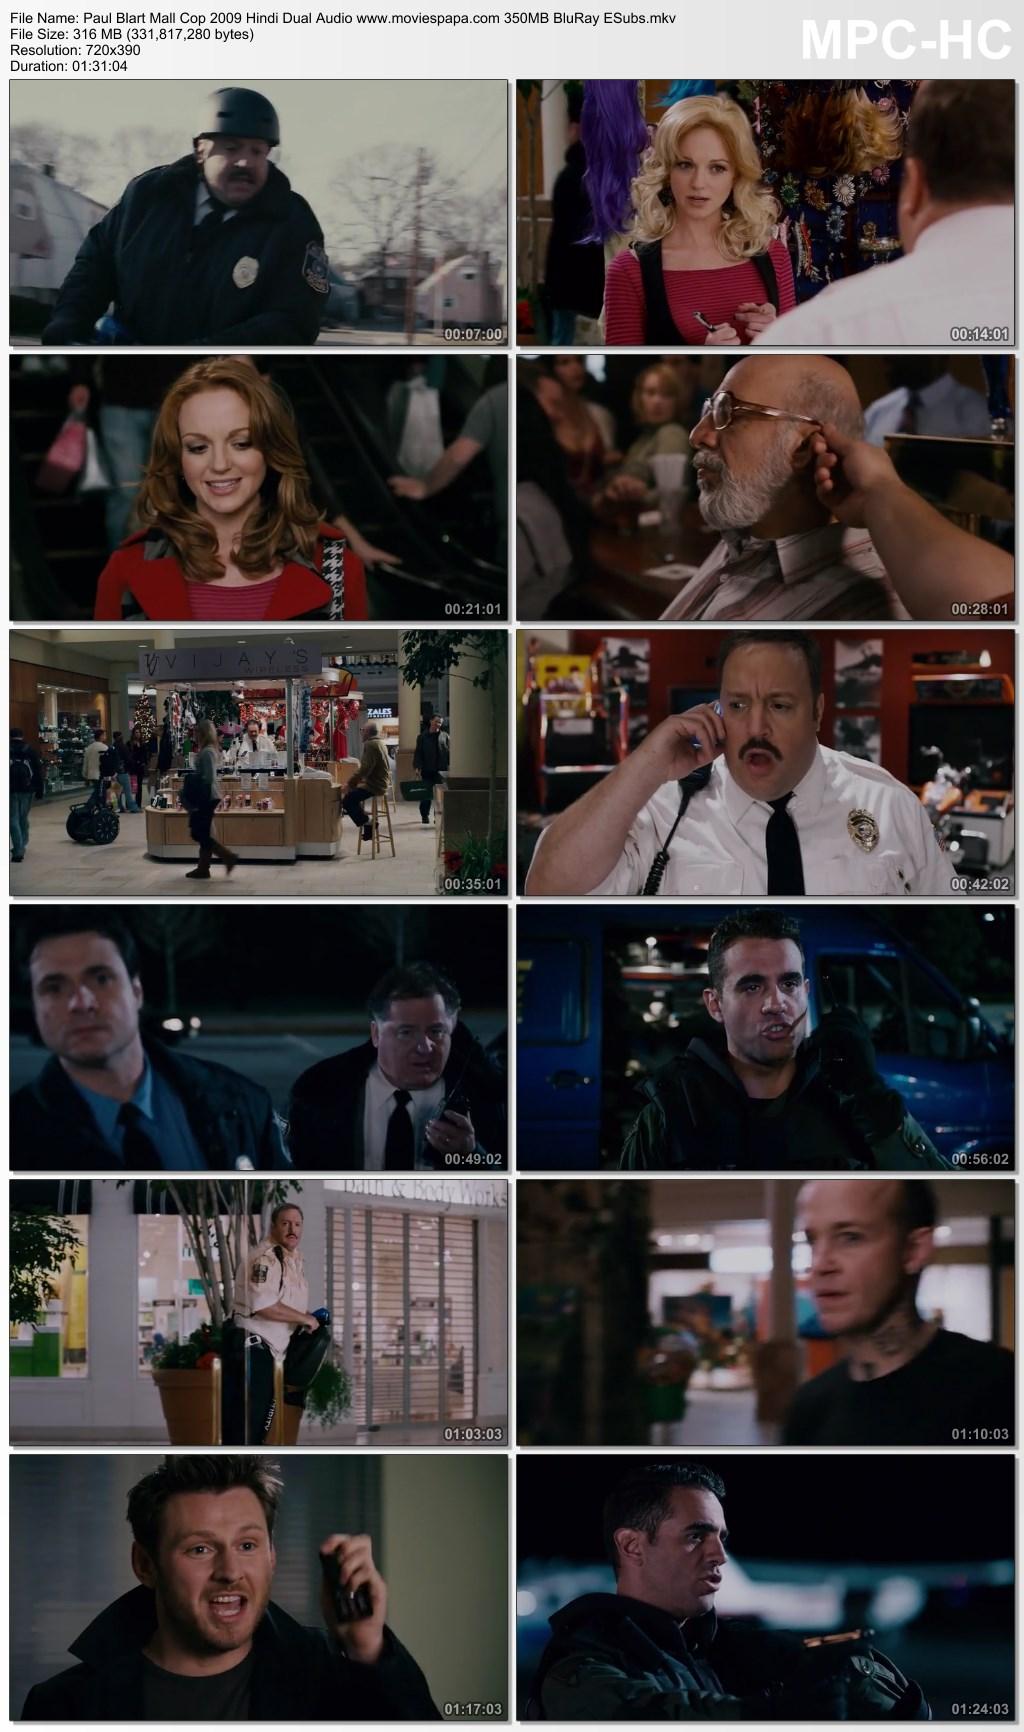 paul blart mall cop (2009) br torrent